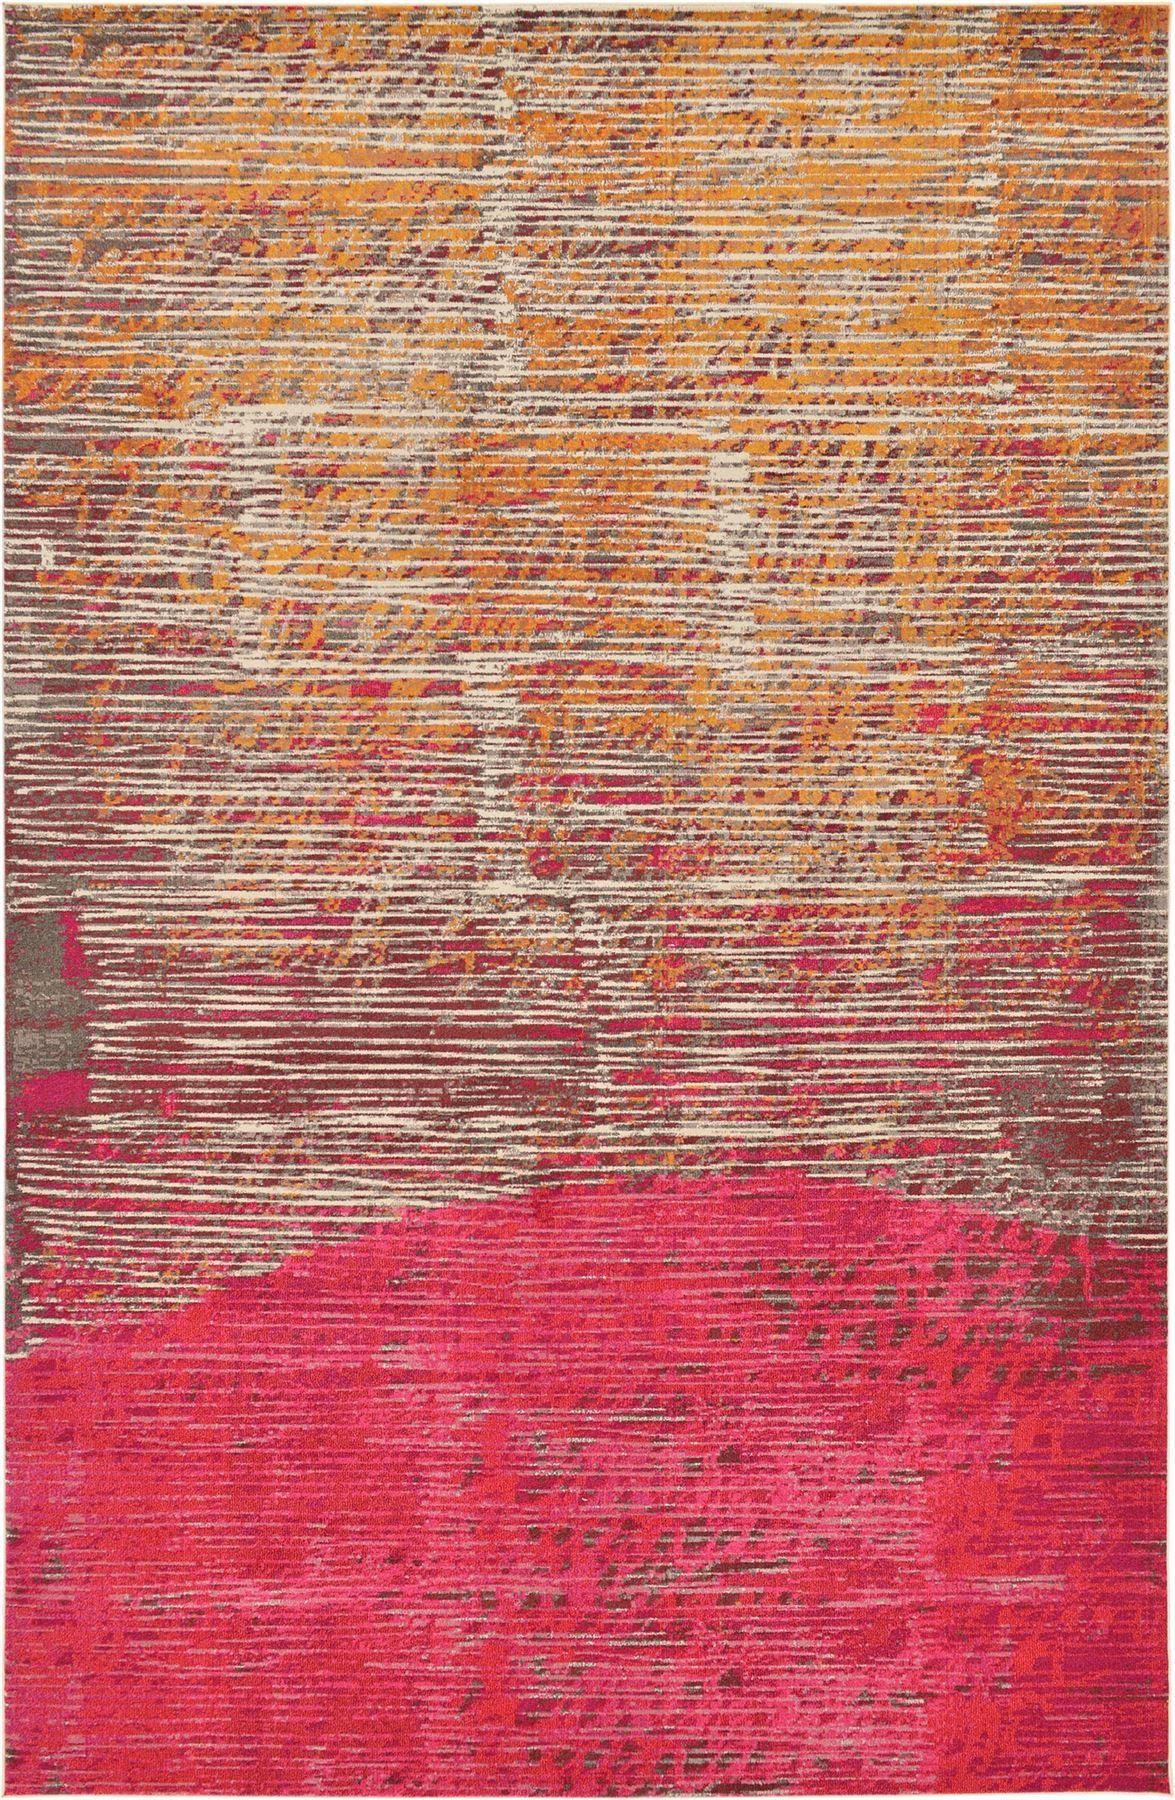 Fringeless Oriental Rugs Modern Striped Carpets Floor Rug